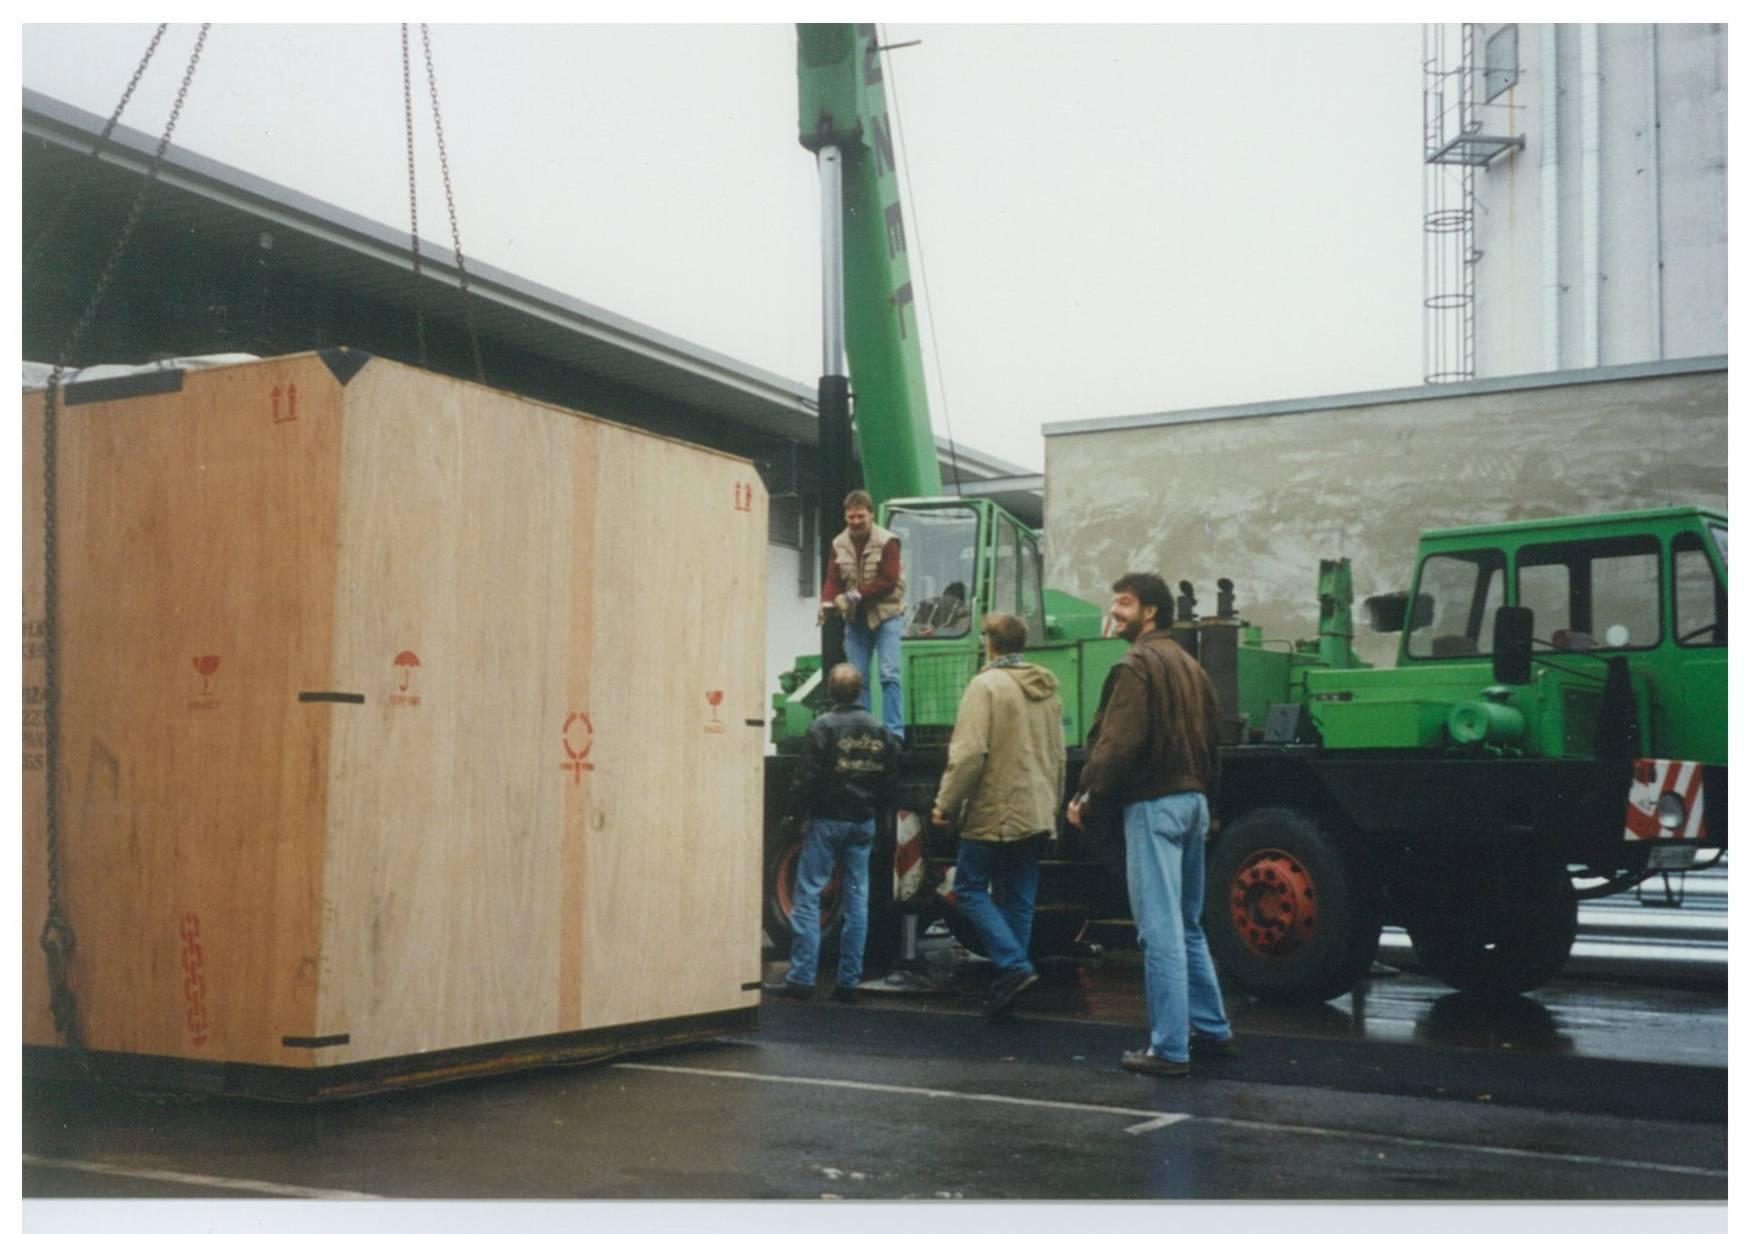 2 Tonnen Laser werden verschoben